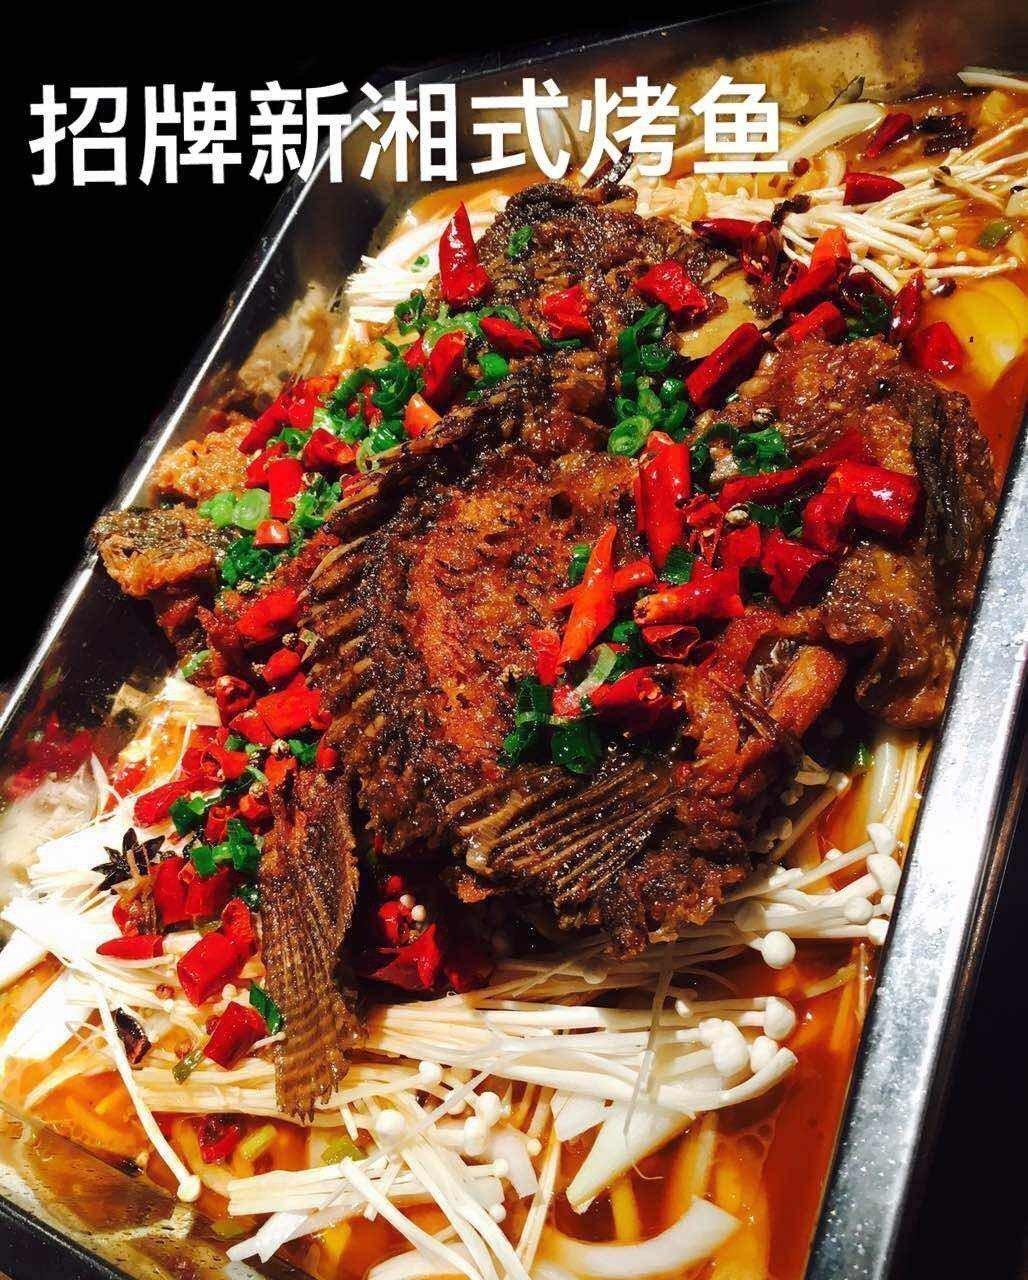 XZXW【湘知湘味】招牌湘式烤鱼